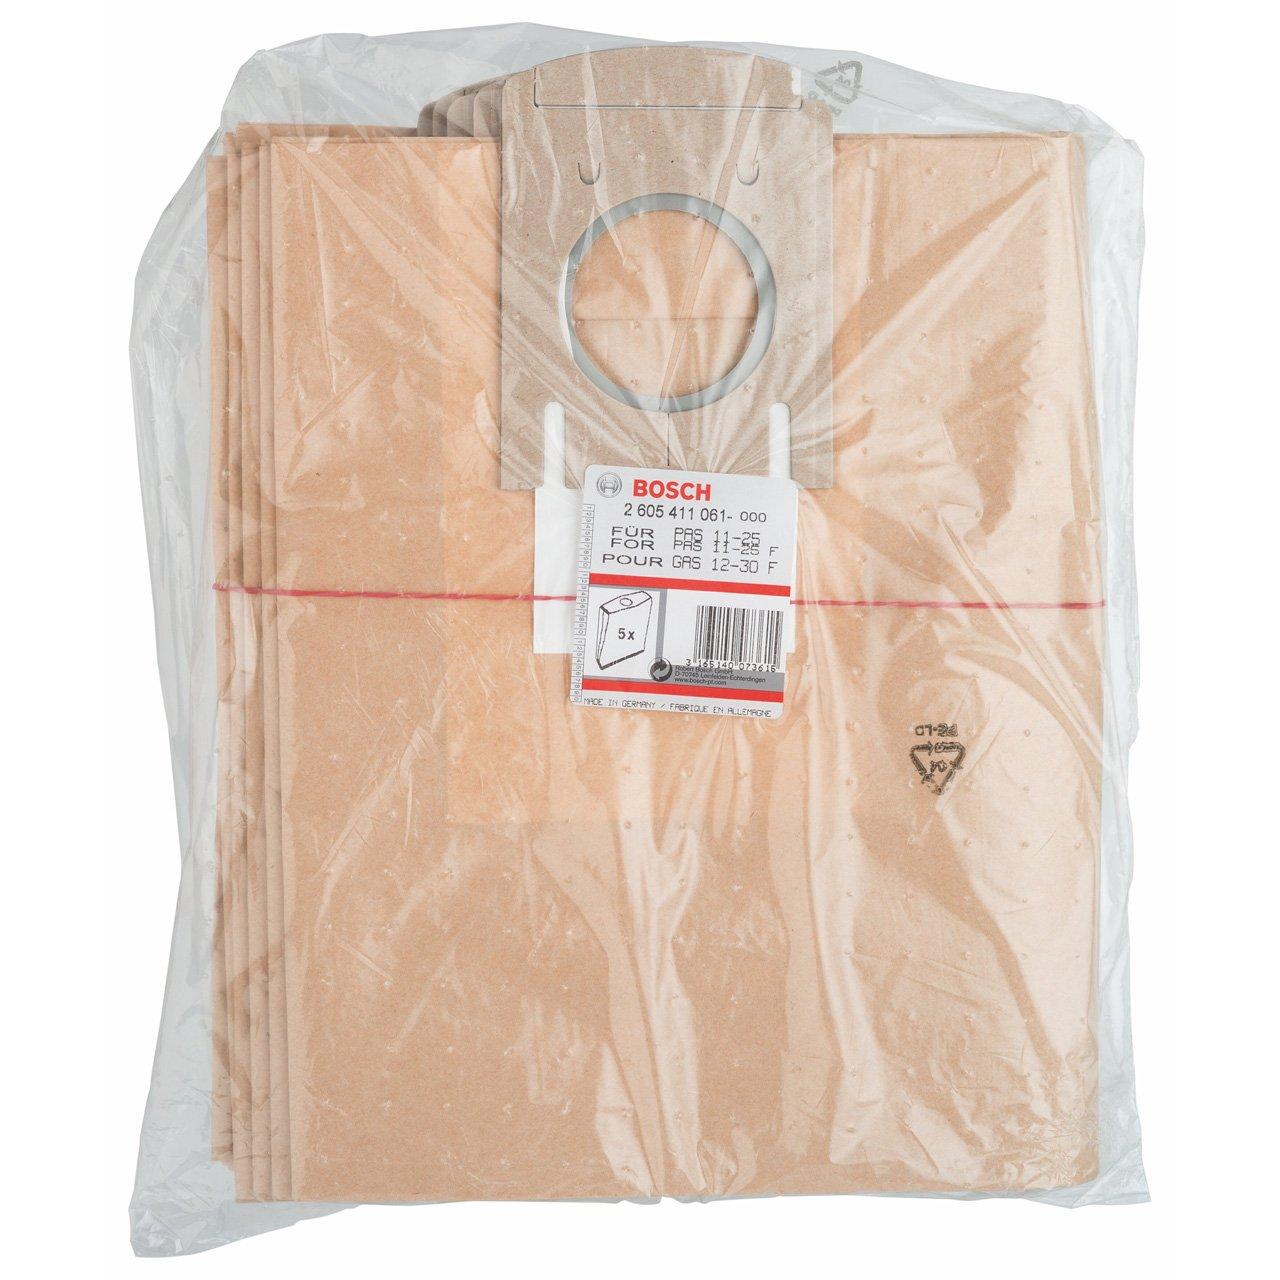 5 Piece Bosch 2605411061 Paper Filter Bag for Bosch Extractors